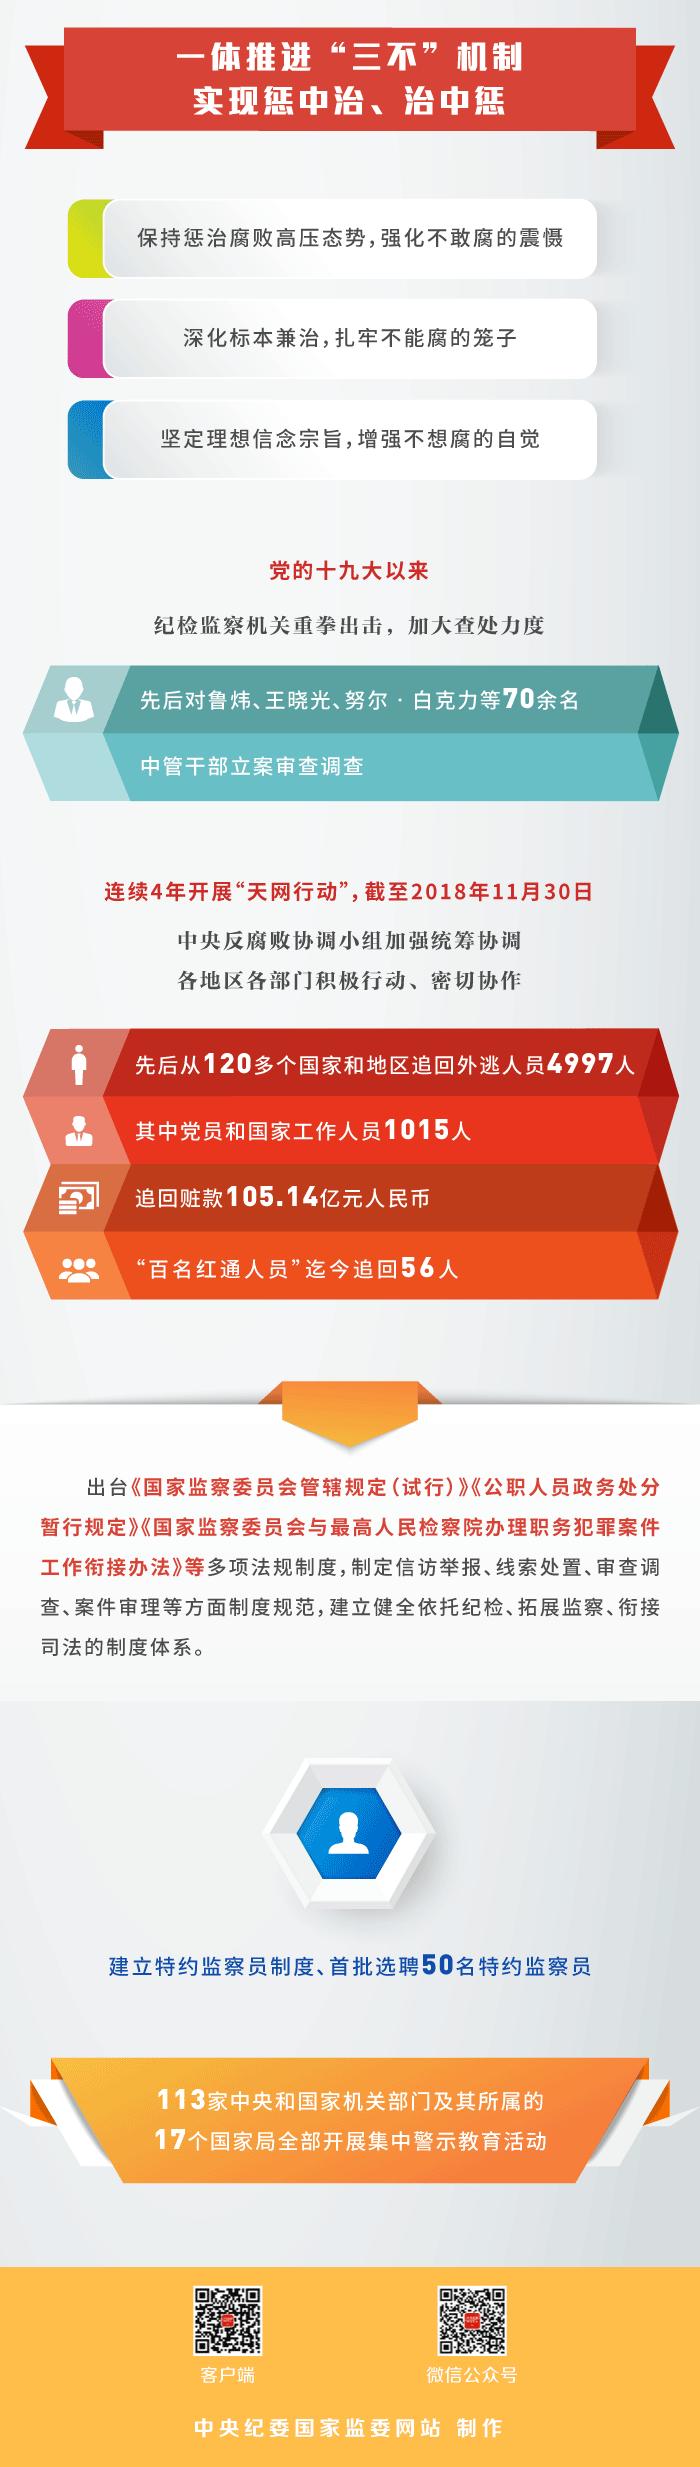 http://www.ccdi.gov.cn/yaowen/201901/W020190109567970192075.jpg